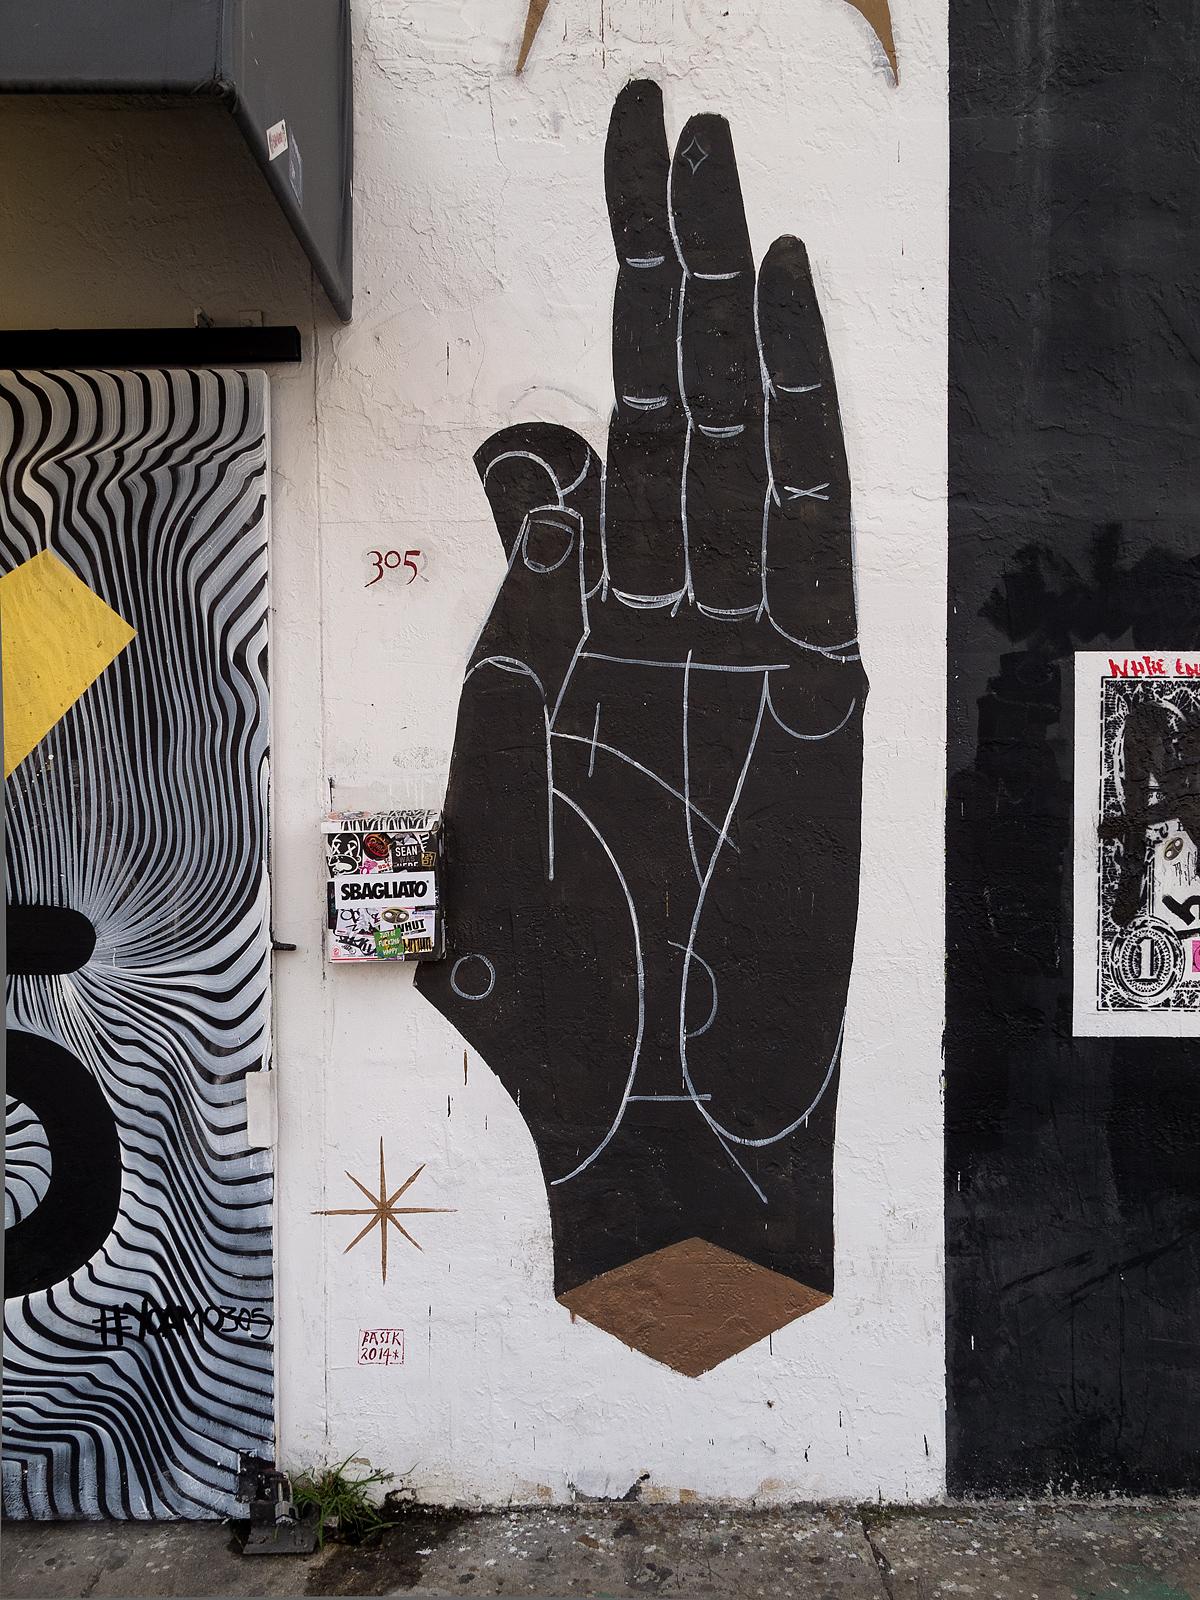 basik-new-mural-at-art-basel-2014-02